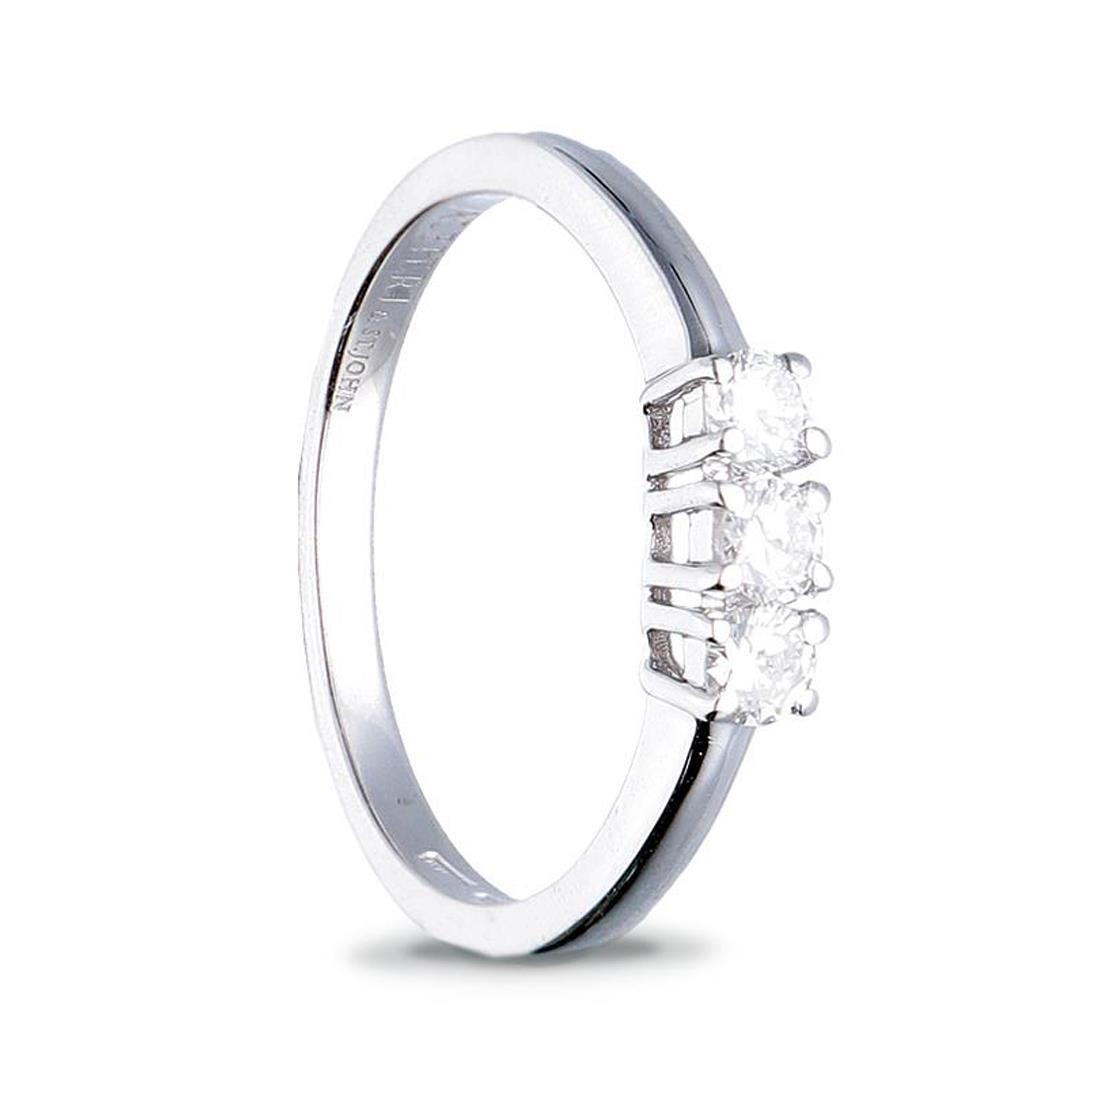 Anillo trilogía en oro blanco, diamantes ct. 0.45 - ALFIERI & ST. JOHN